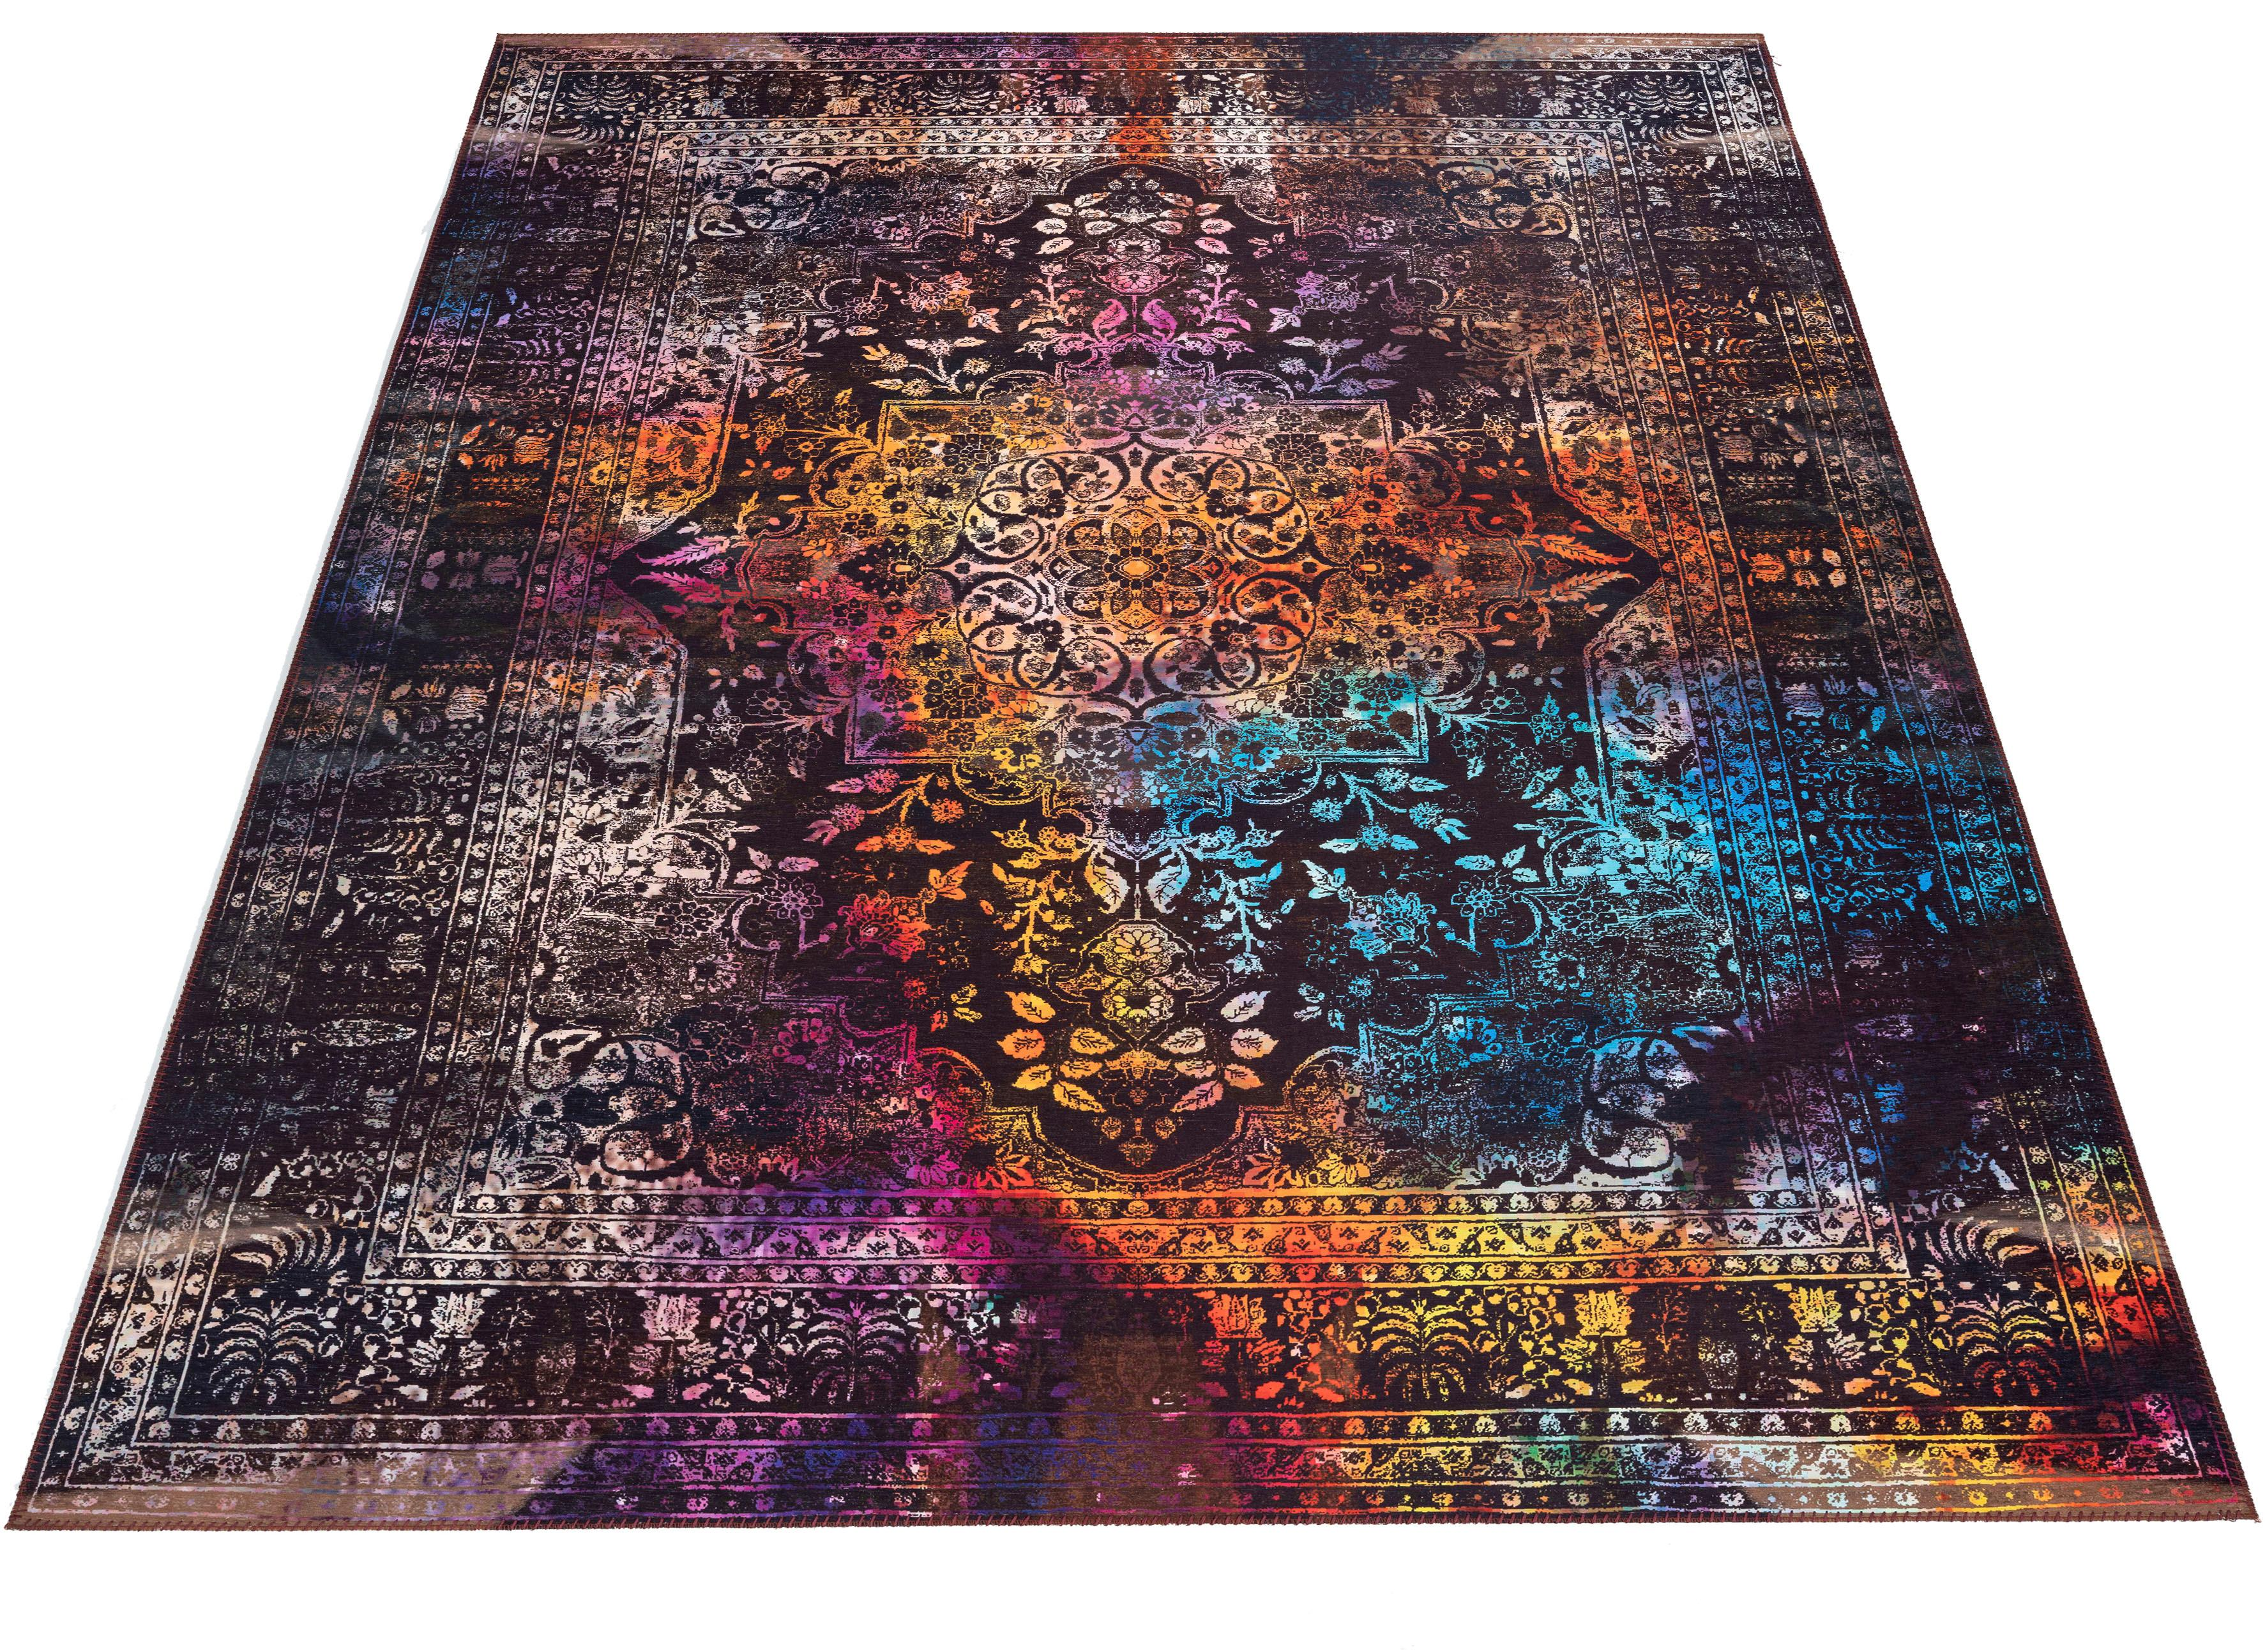 Teppich Emery Bruno Banani rechteckig Höhe 6 mm maschinell gewebt